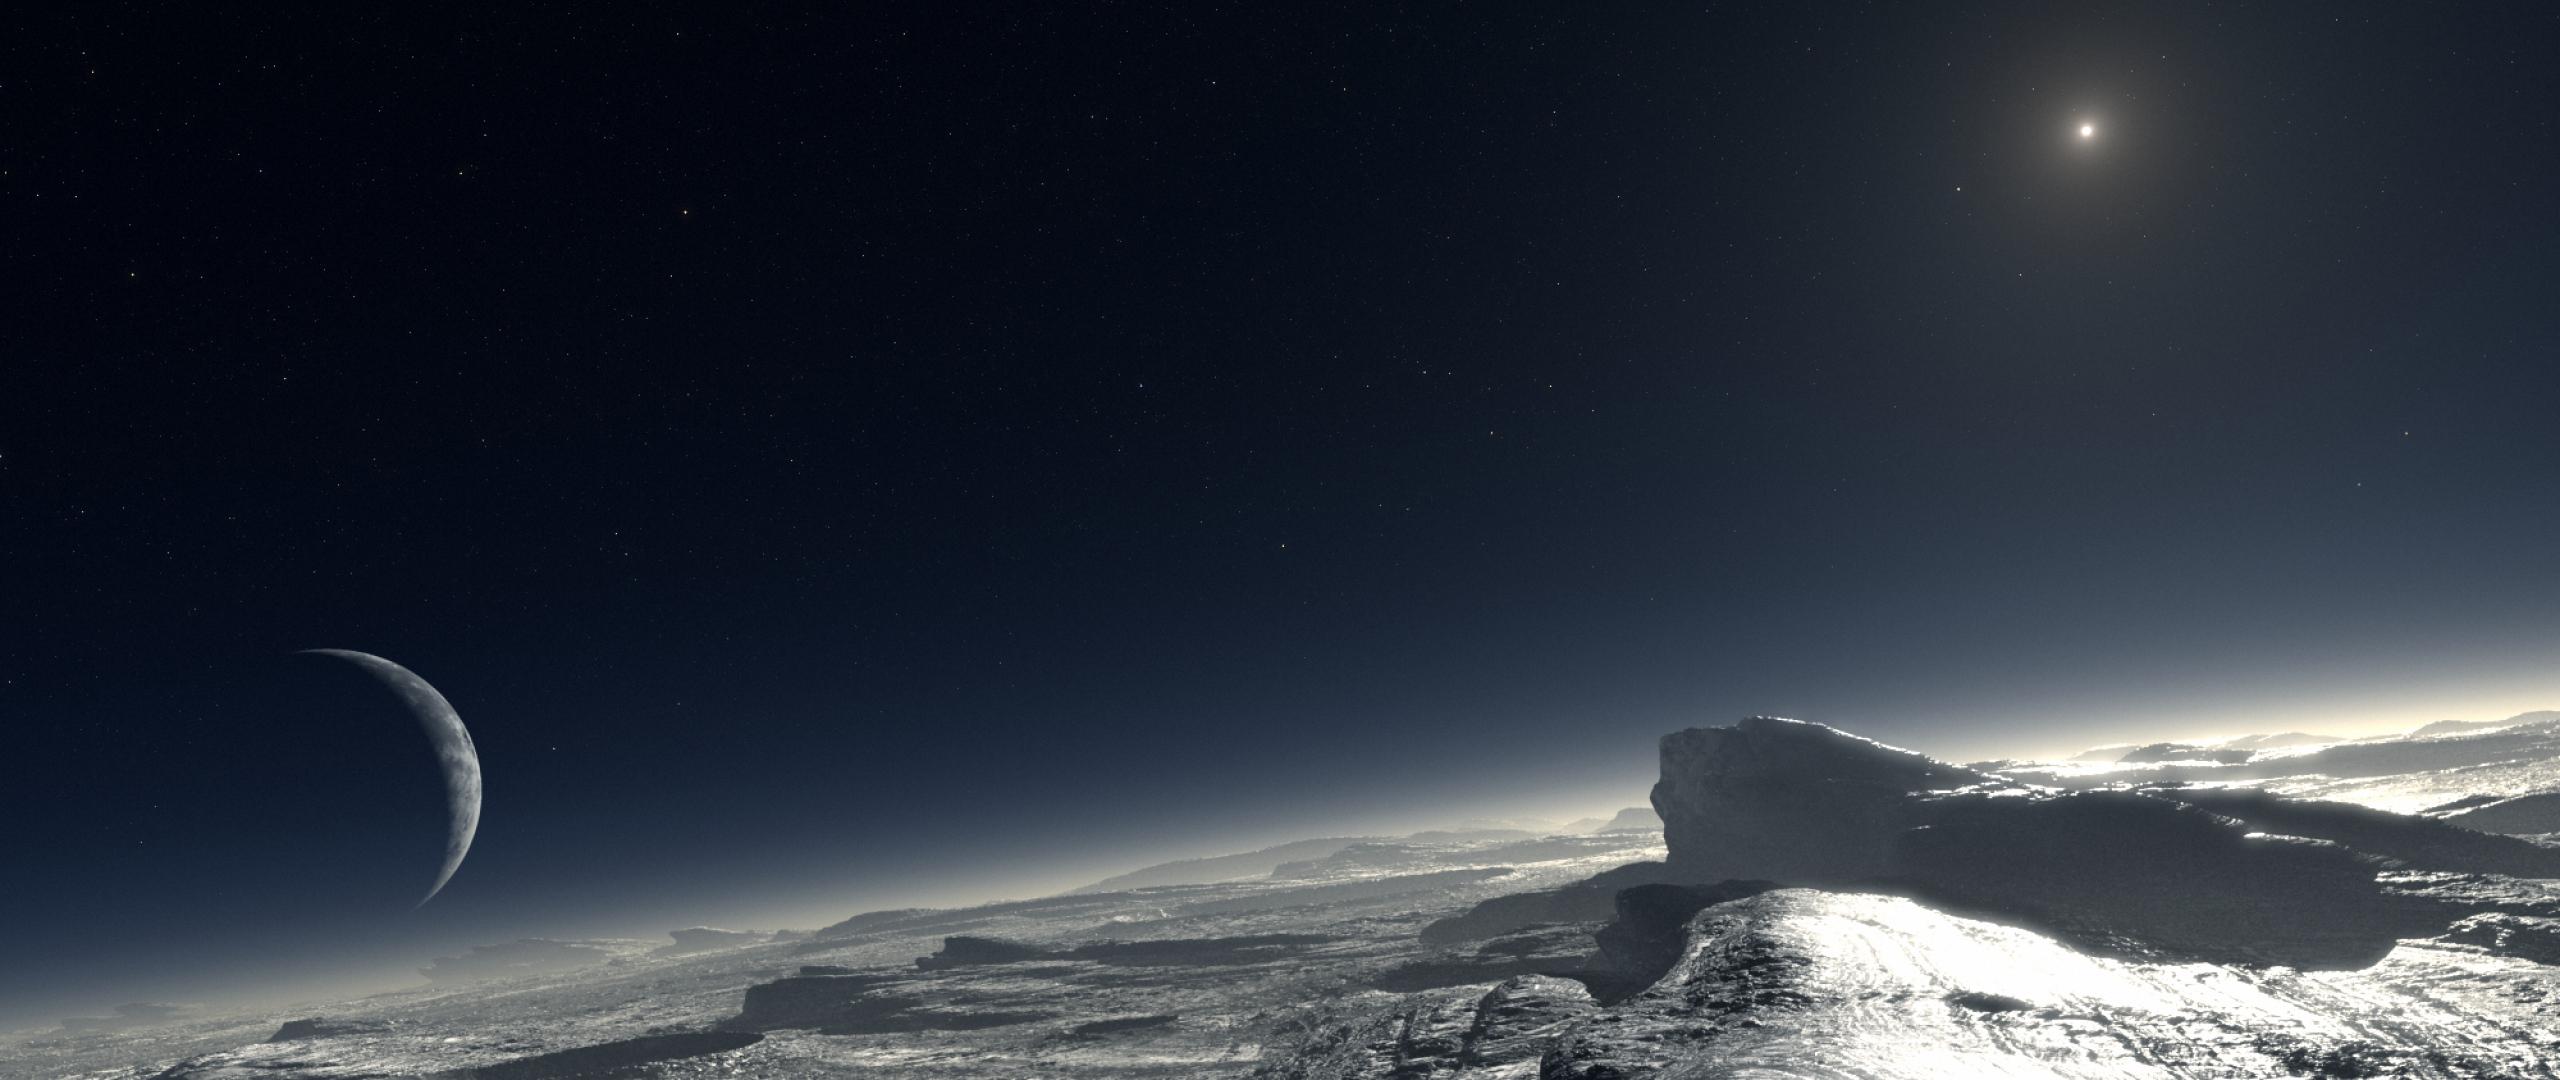 HD Pluto Wallpaper